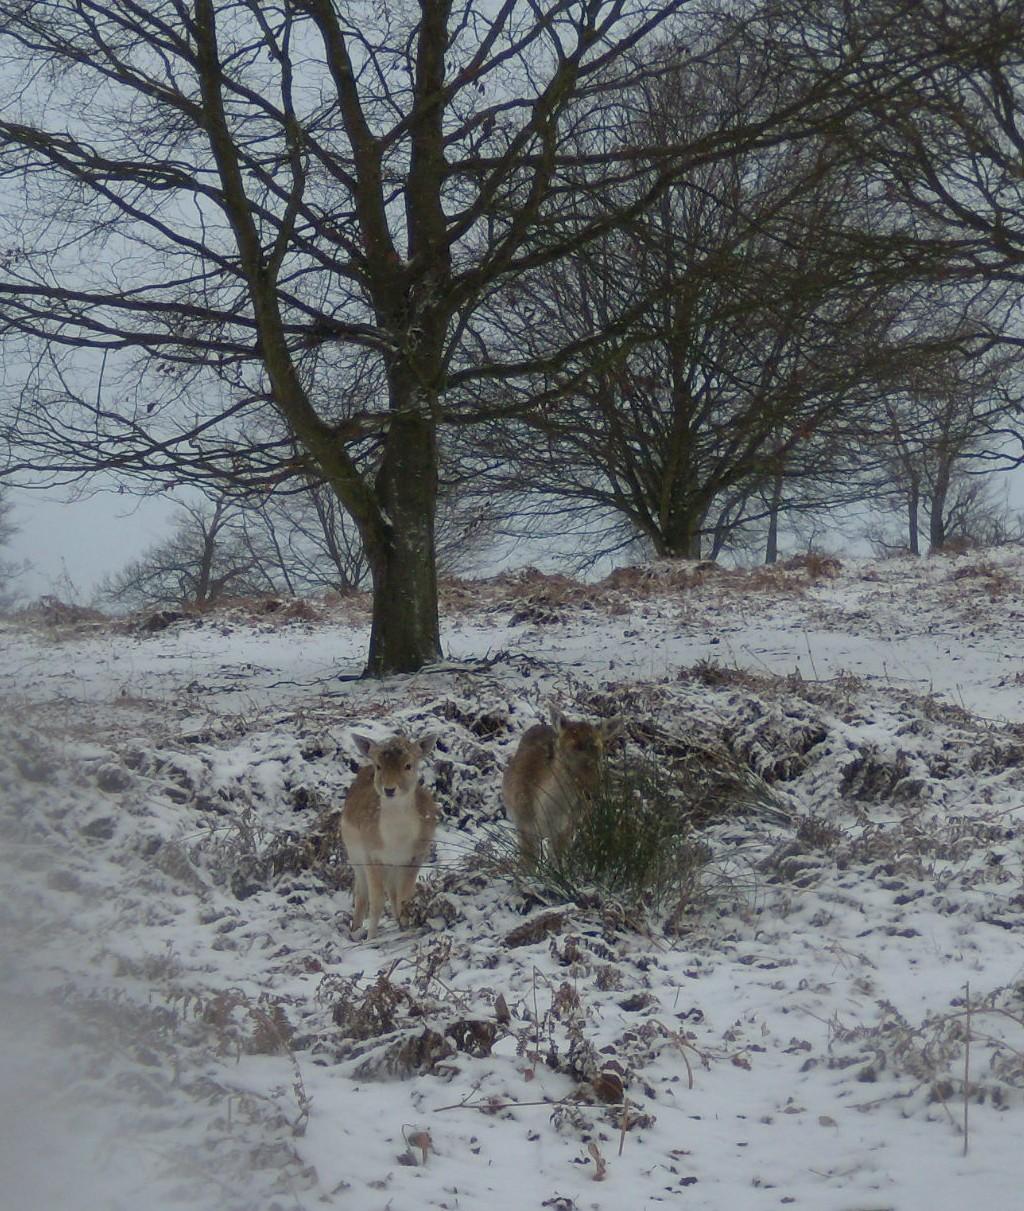 Deer - Knole Park Leigh to Sevenoaks